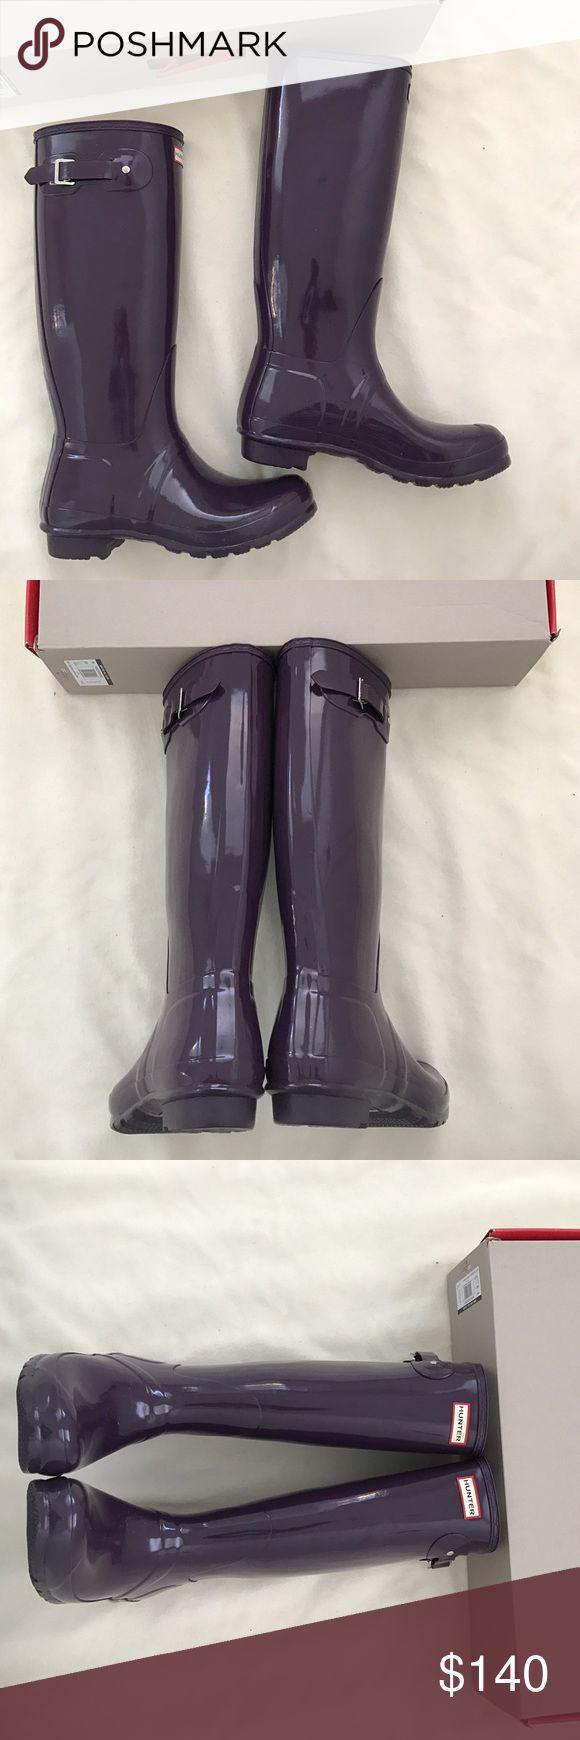 Brand new Hunter glossy rain boots New in box US size 8 Hunter Boots Shoes Winter & Rain Boots